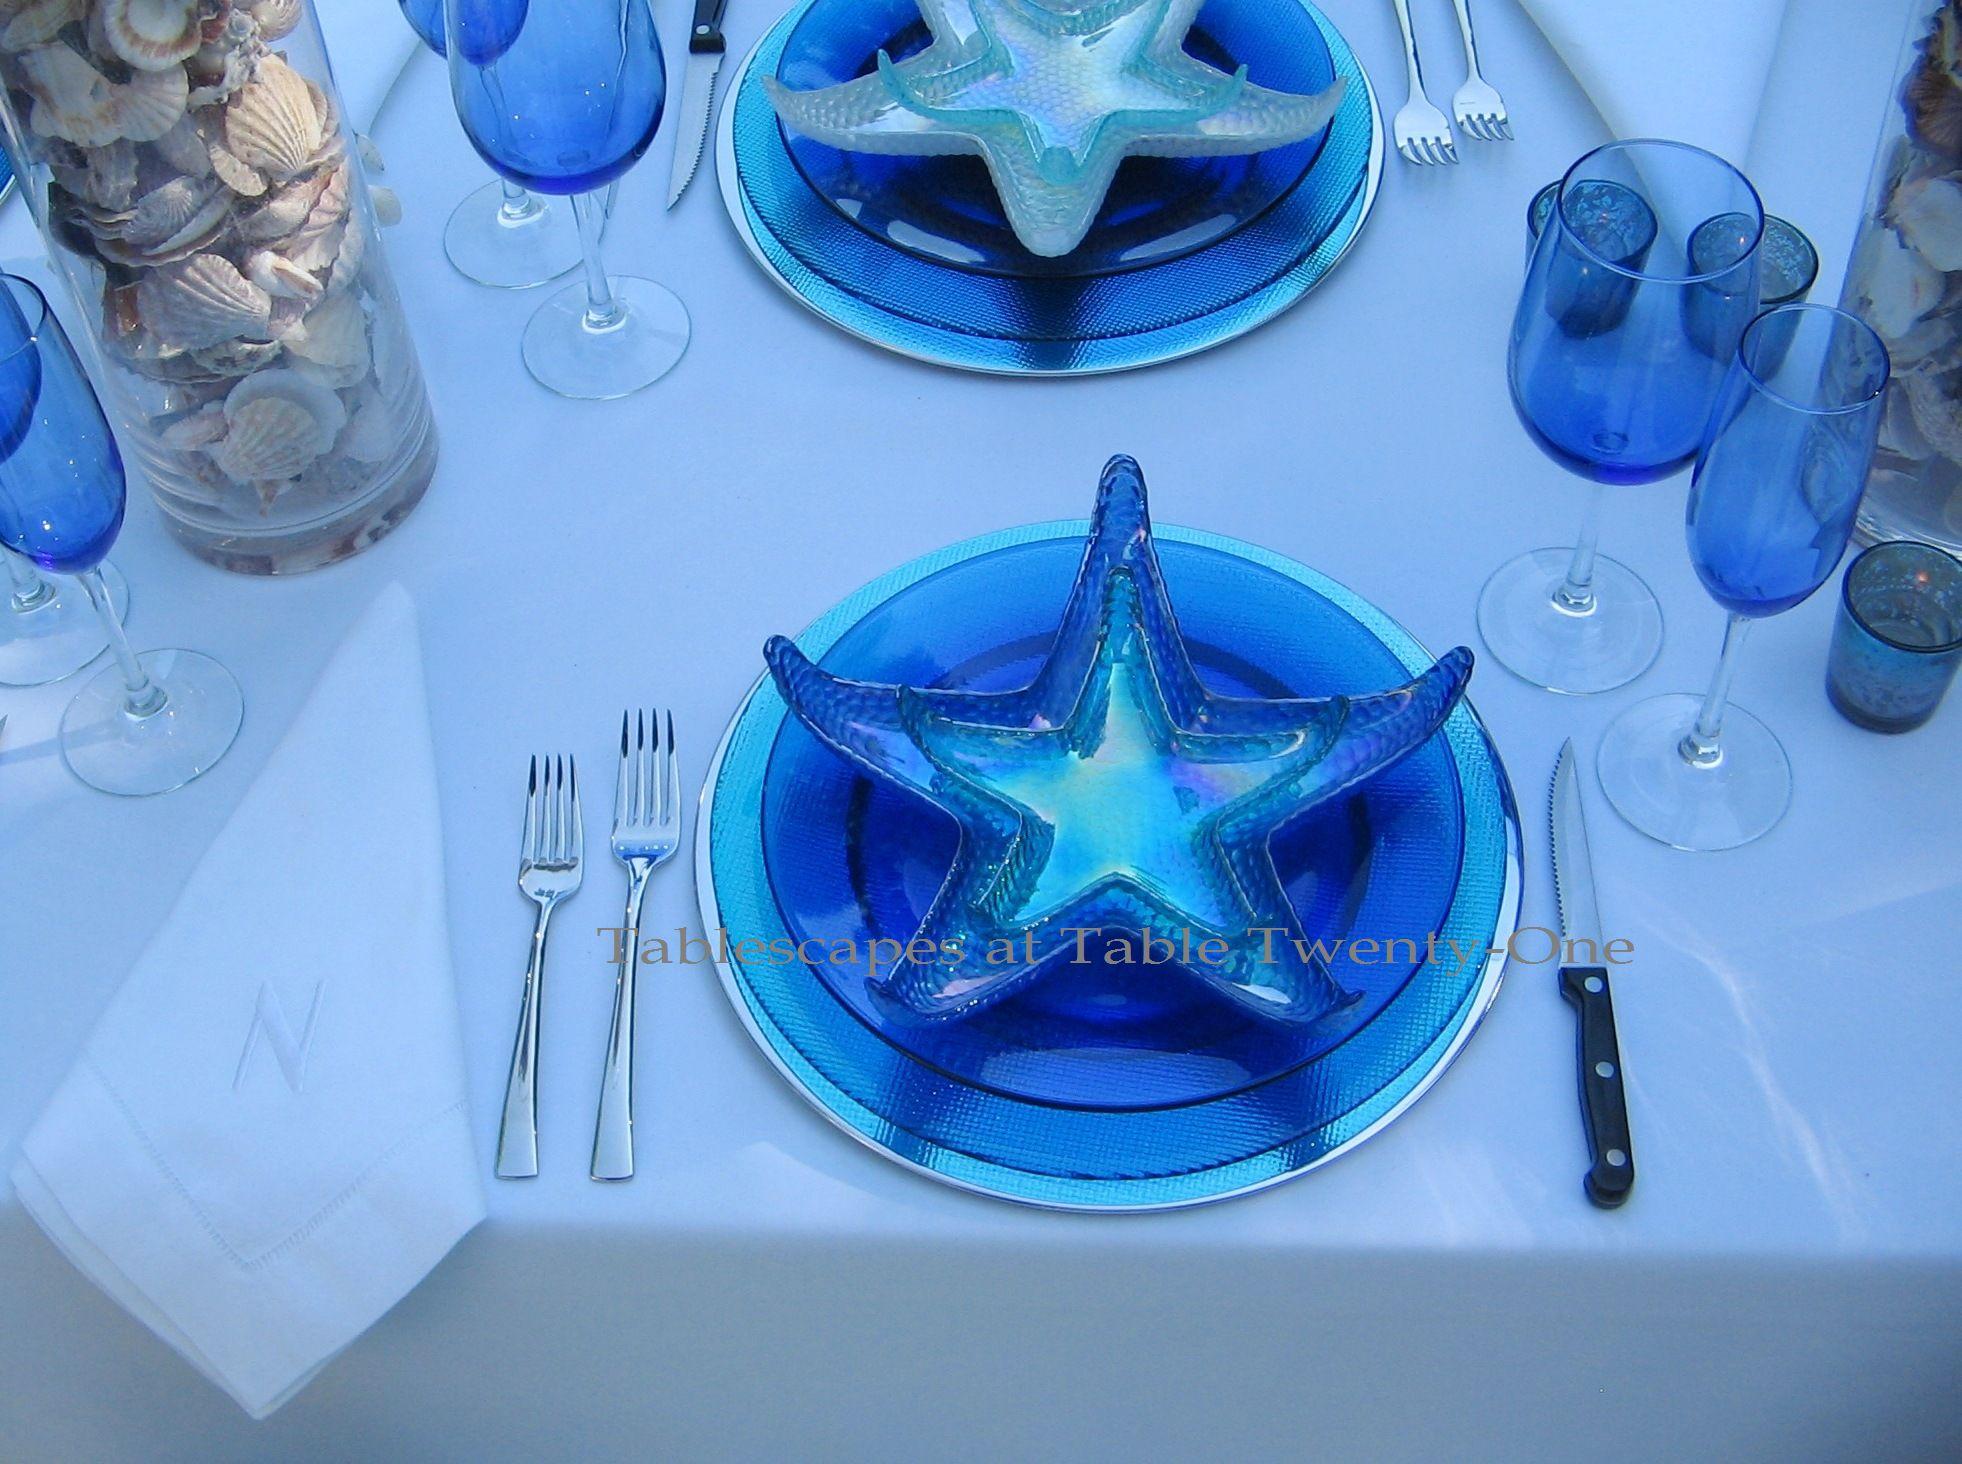 Tablescapes at Table Twenty-One, www.tabletwentyone.wordpress.com, Ocean Blue – Starfish & Seashells:  Single place setting with glass starfish plates, Rocco Bormioli glass chargers